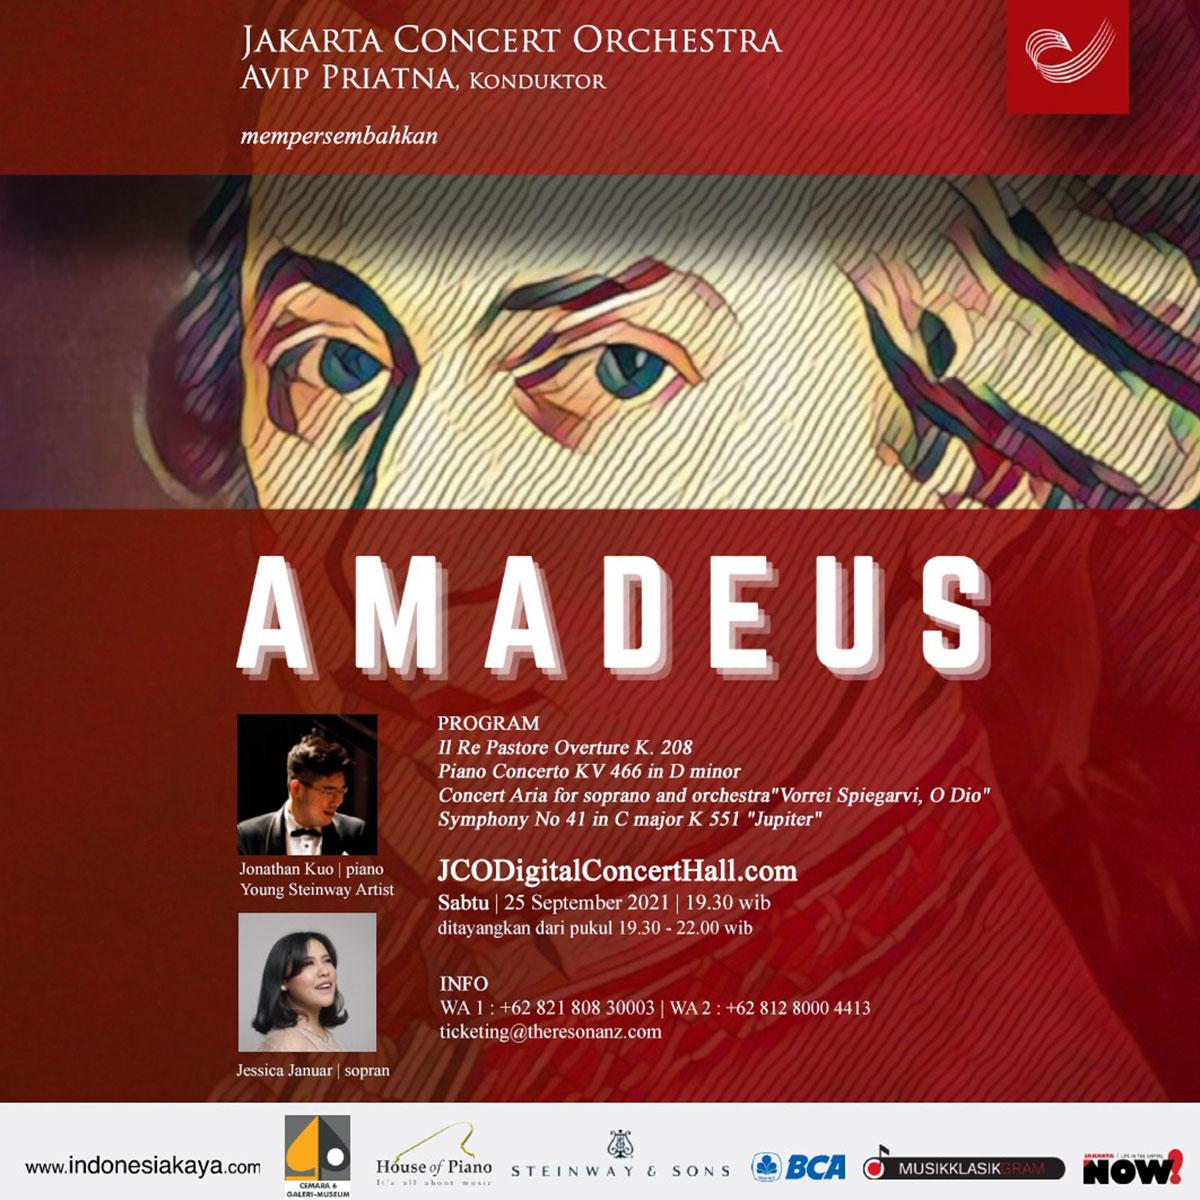 amadues-concert-jakarta-concert-orchestra